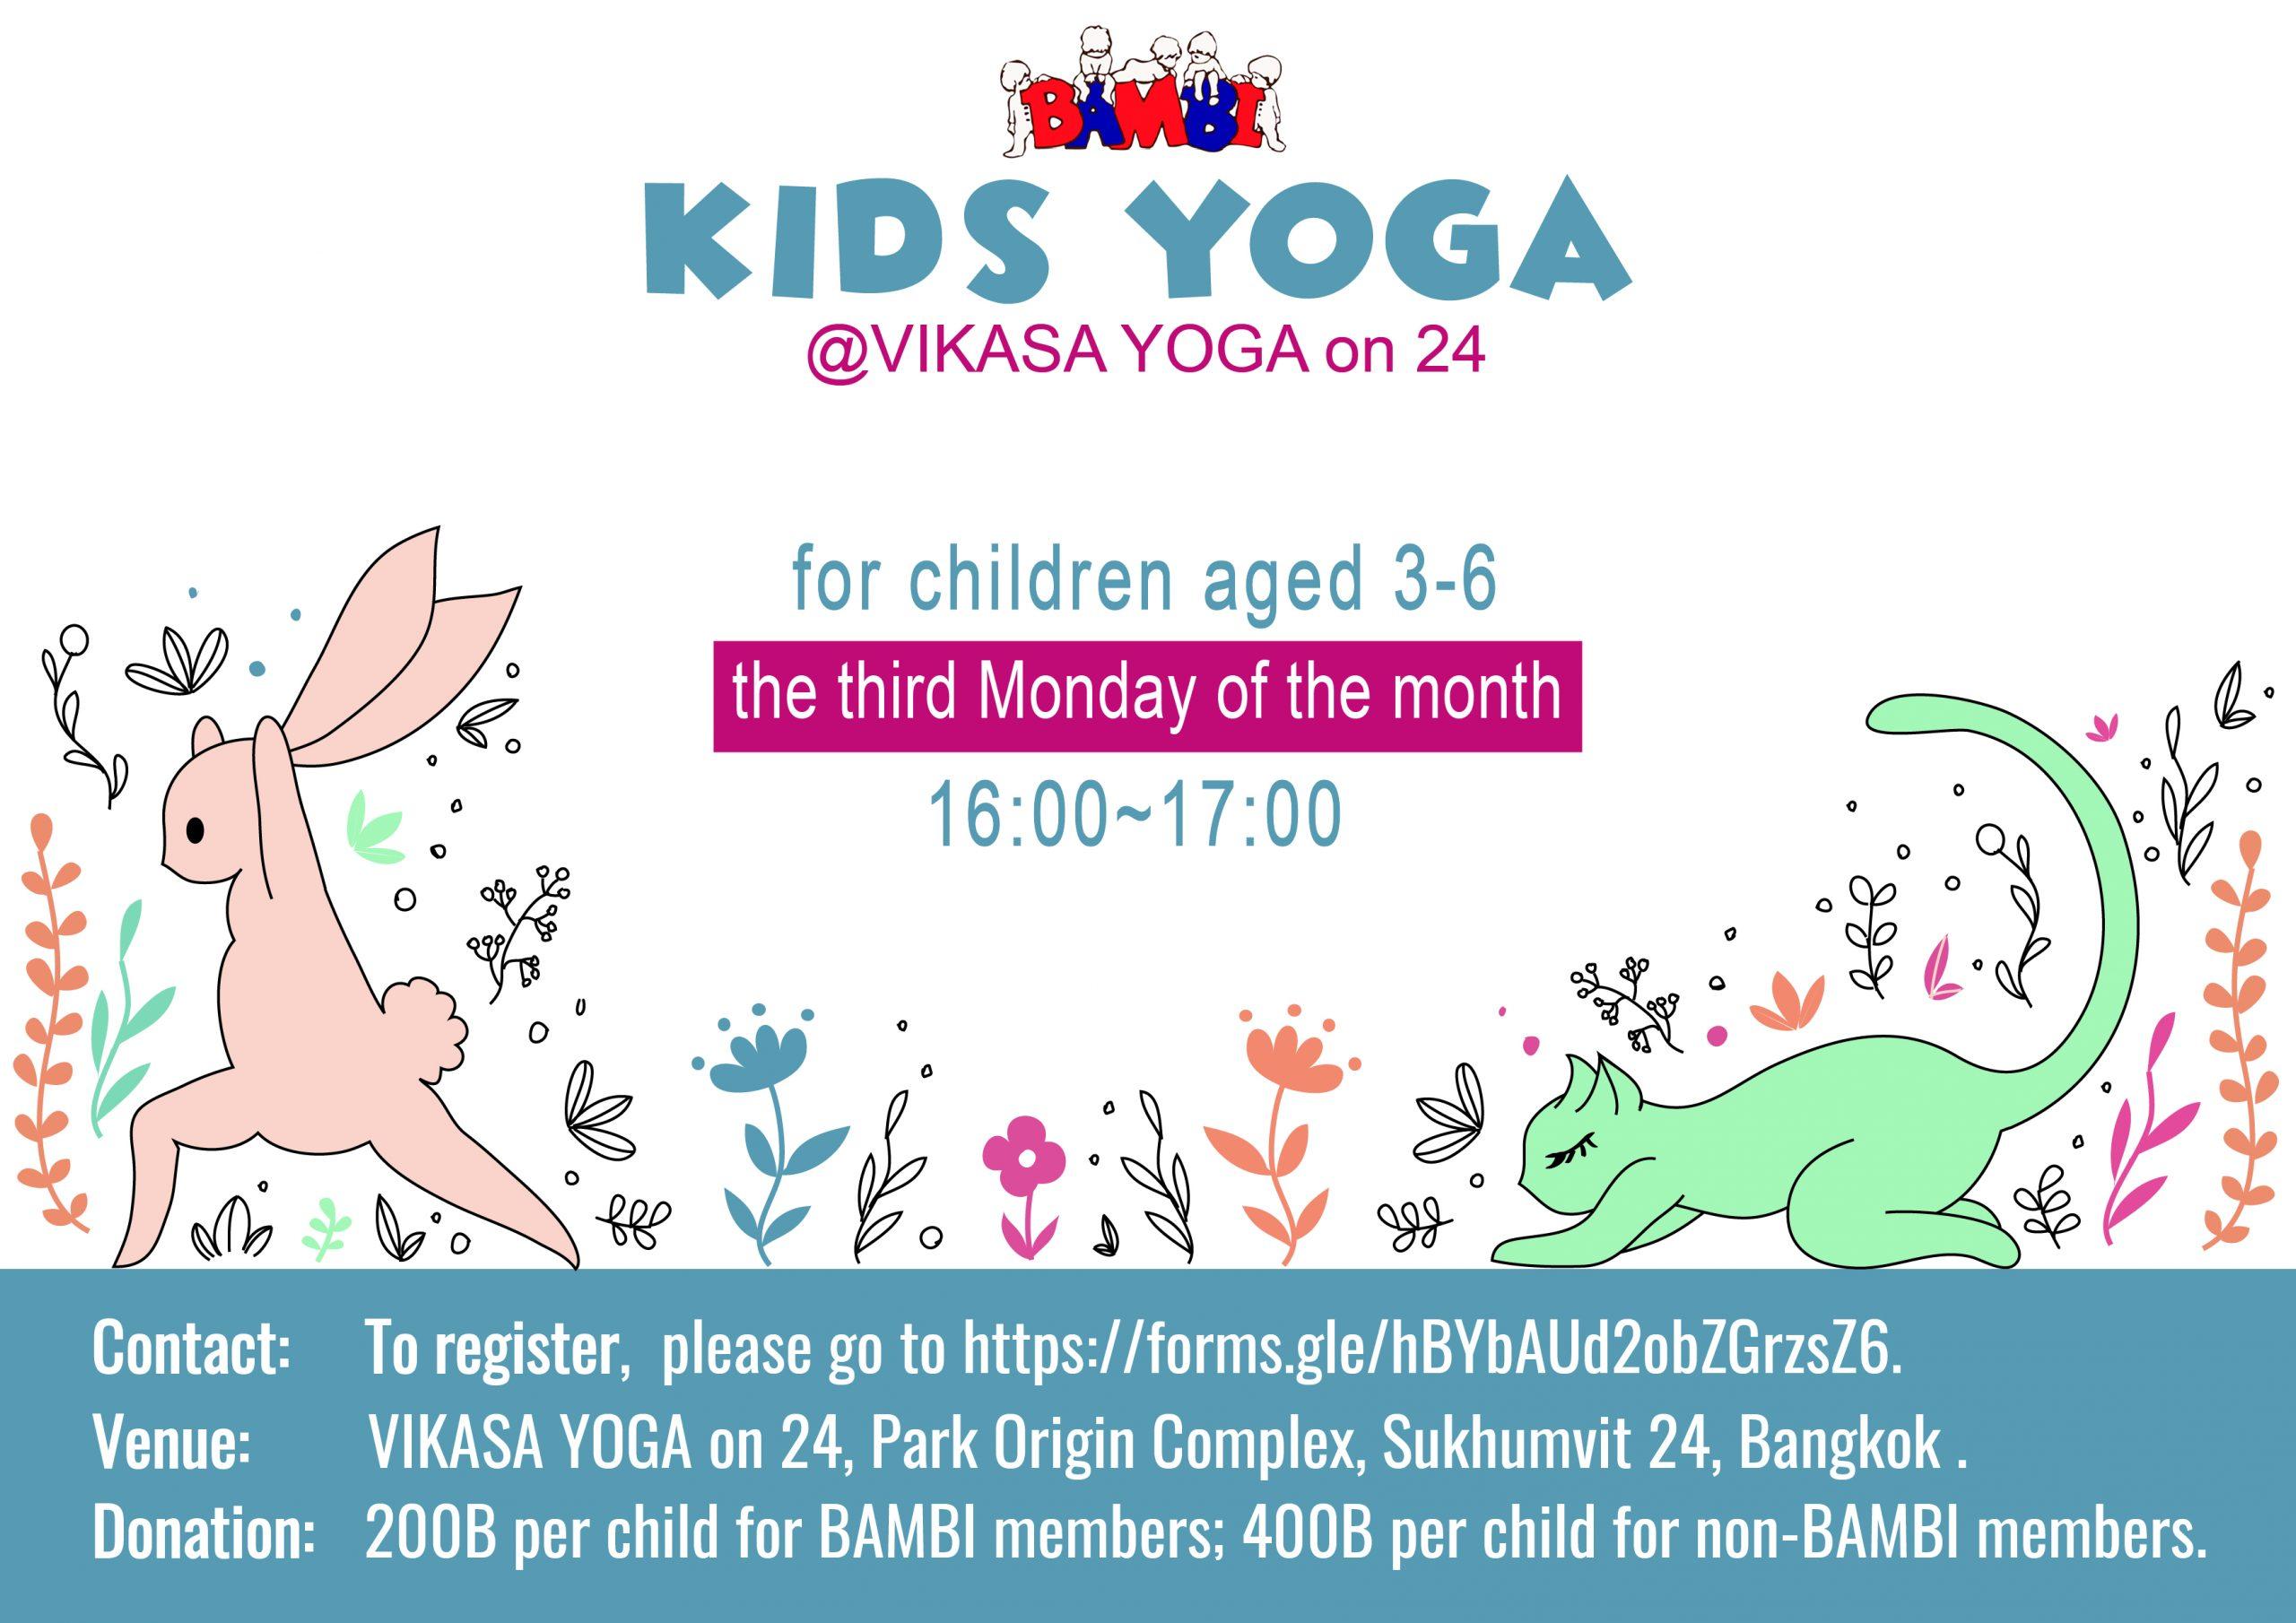 Kids Yoga @ Vikasa Yoga on 24